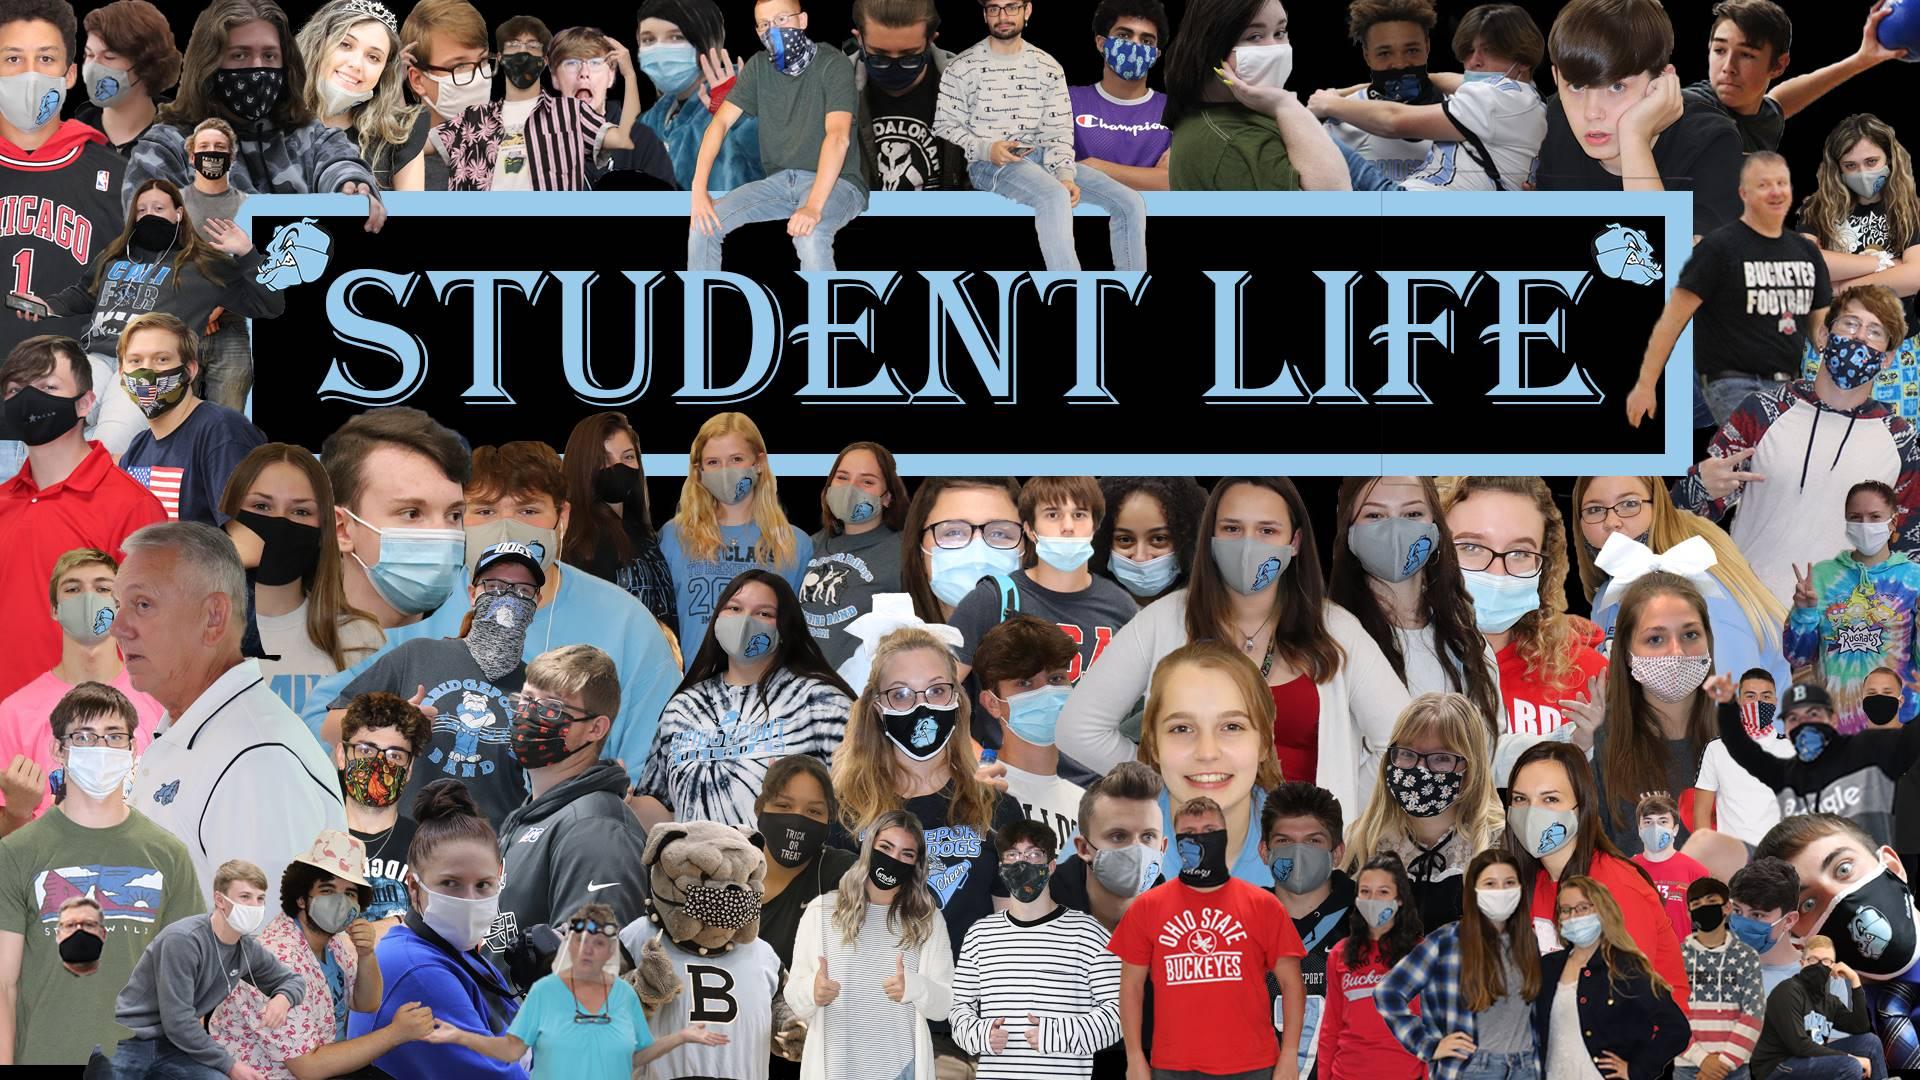 3 Jayden Student Life Image